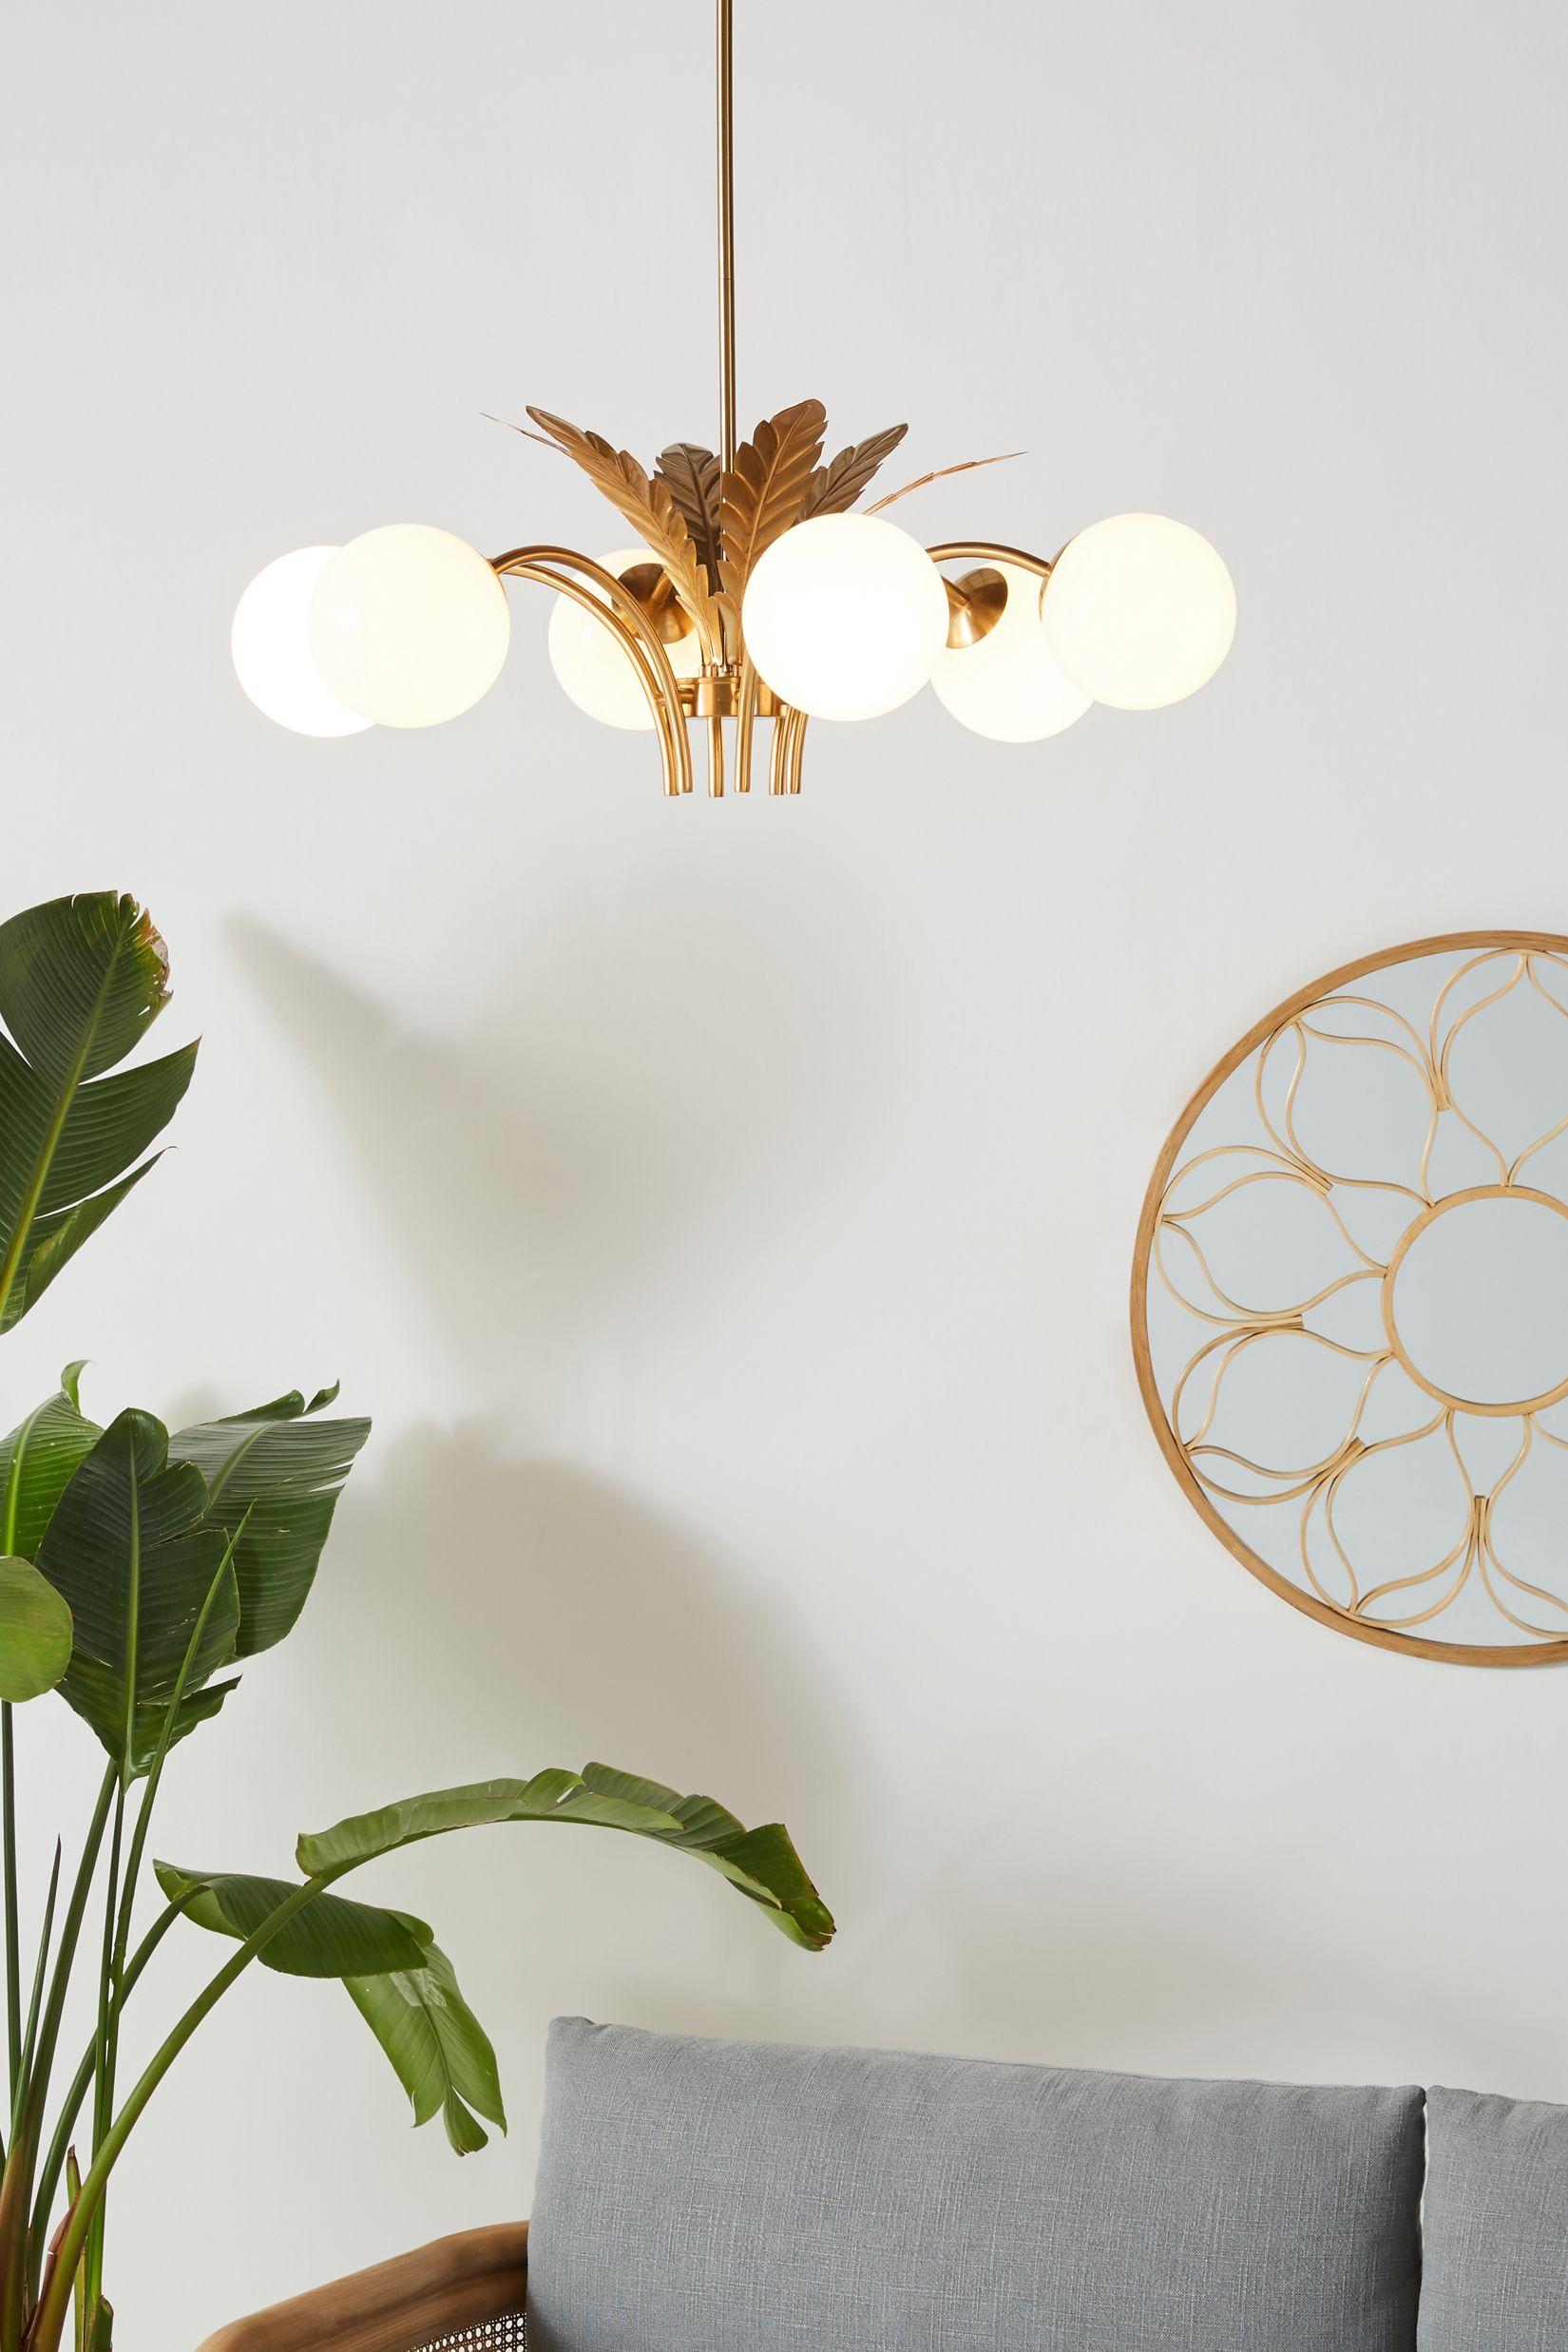 Anthropologie?s unique home lighting